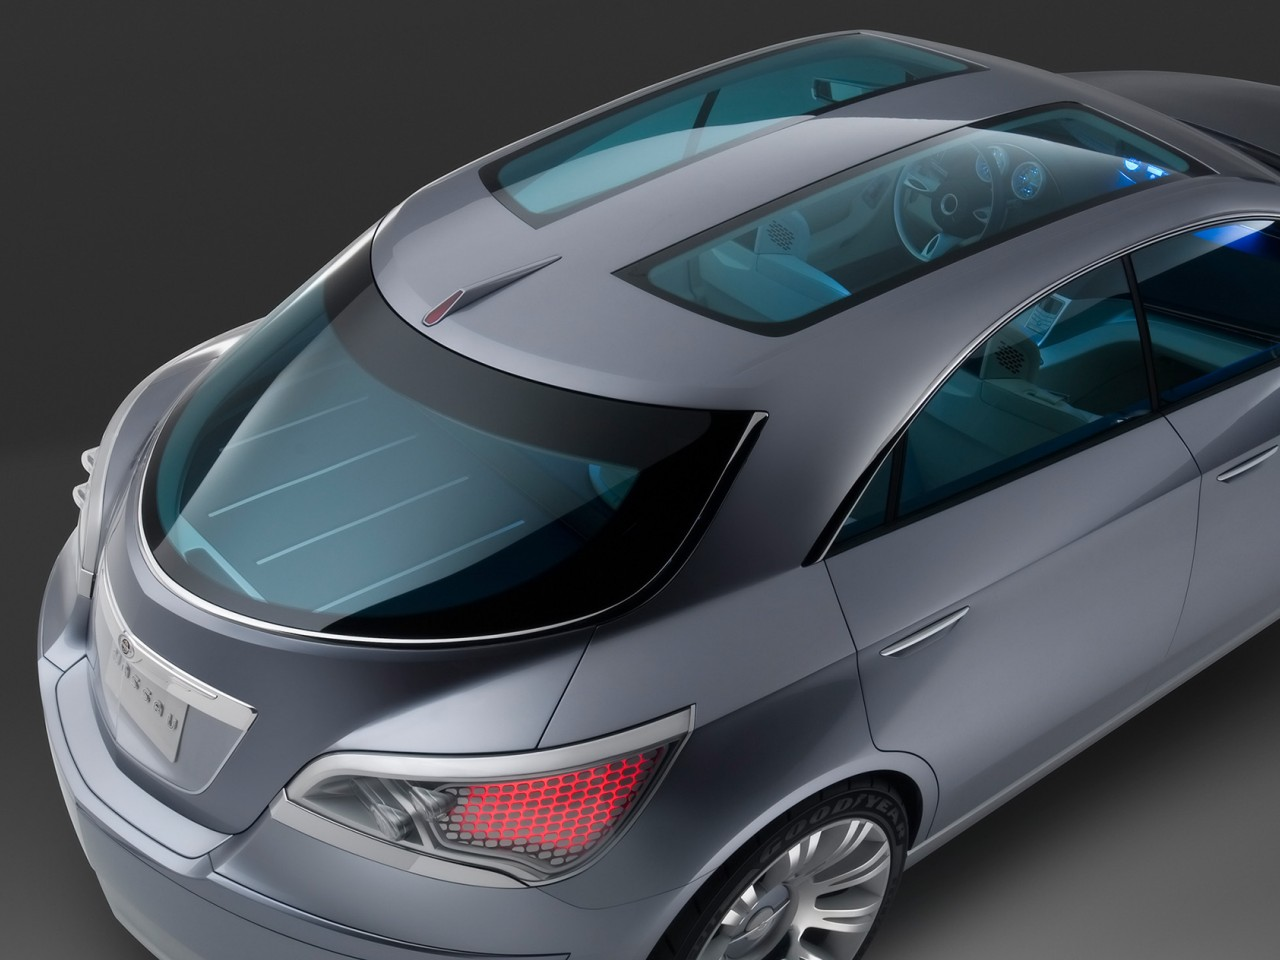 2007 Chrysler Nassau Concept | Motor Desktop